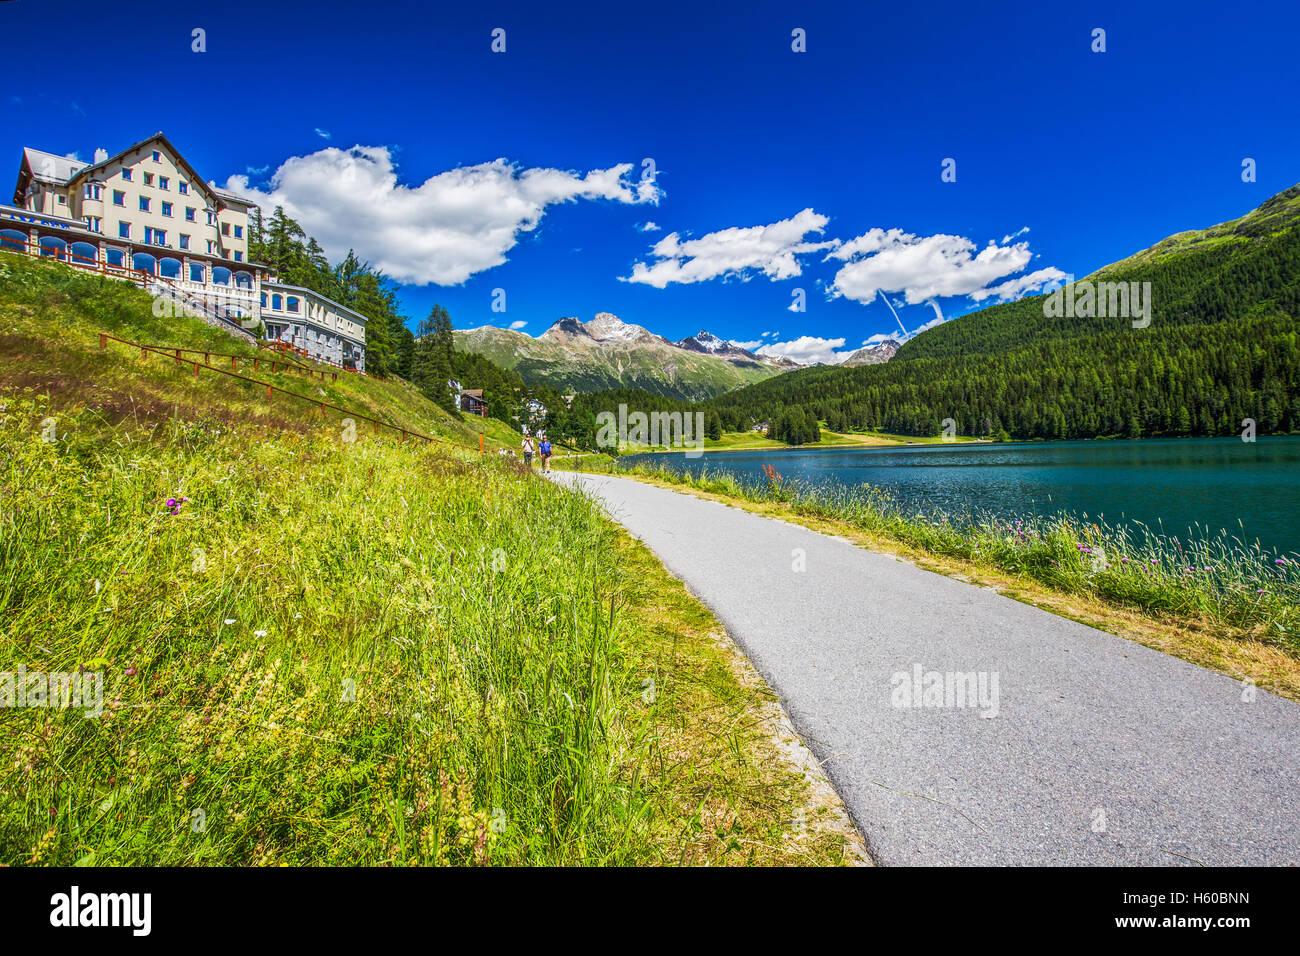 Sankt Moritz lake. St. Moritz (German - Sankt Moritz; Italian - San Maurizio) is a high Alpine resort in th - Stock Image